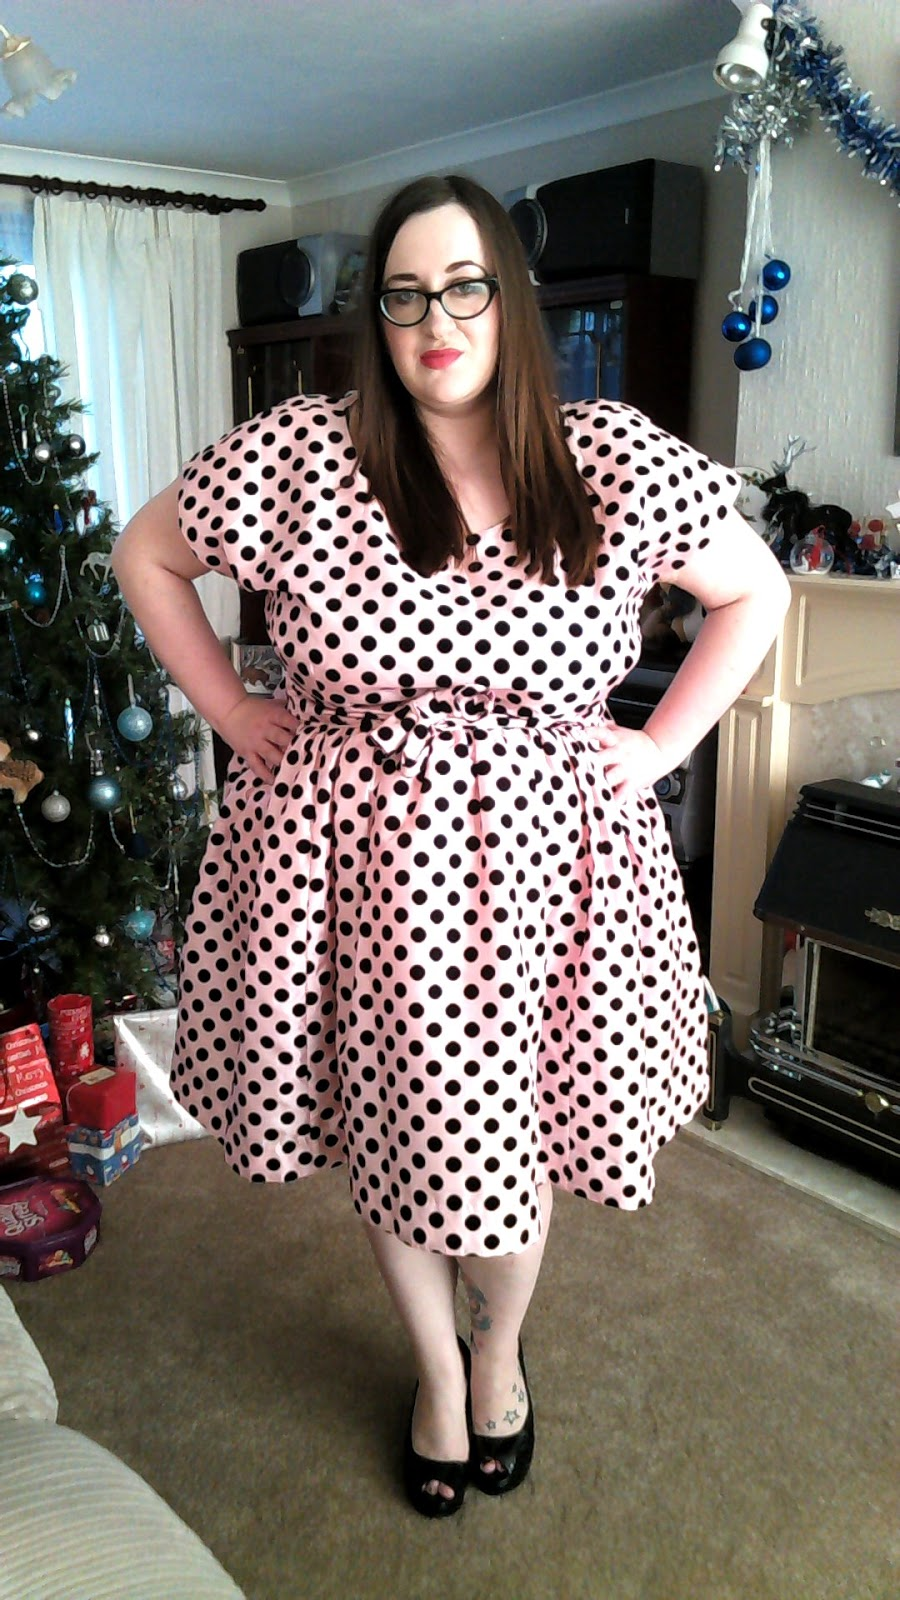 Fat Plus Size Girl Bbw Size 20 22 Wearing Modcloth The Nicolette Dress